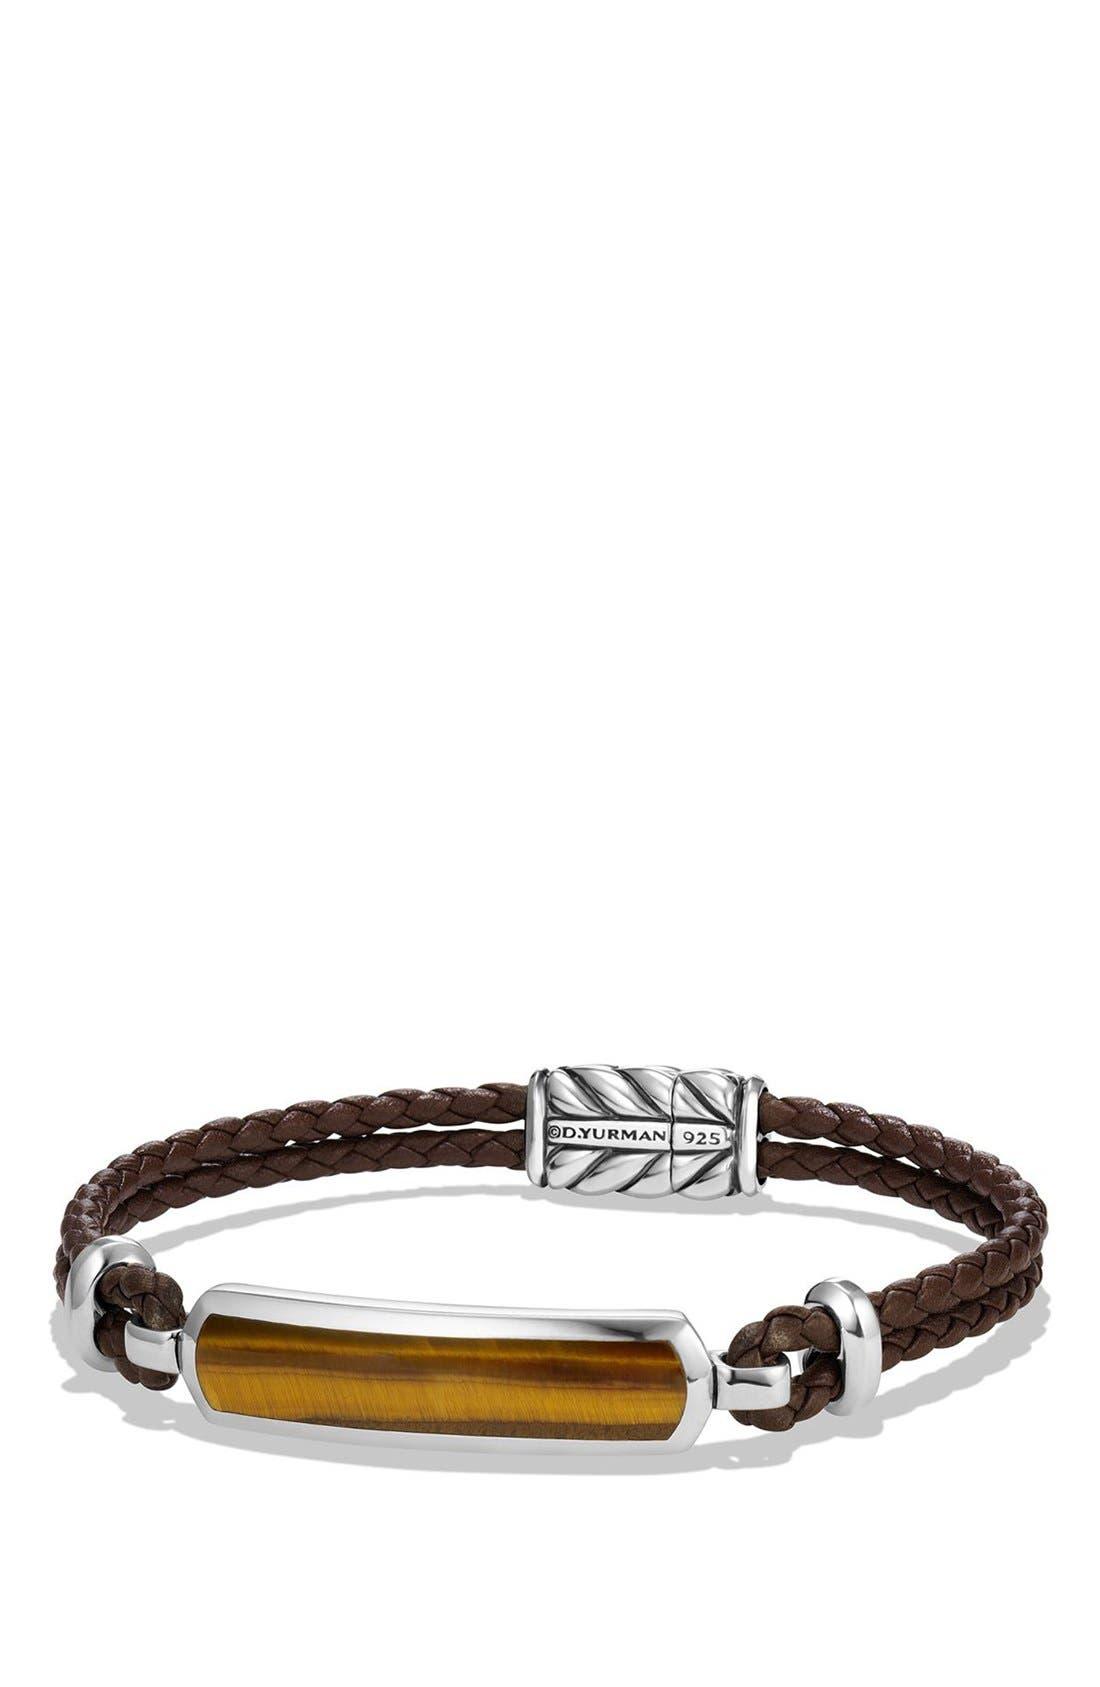 DAVID YURMAN, Bar Station Leather Bracelet, Main thumbnail 1, color, SILVER/ TIGERS EYE